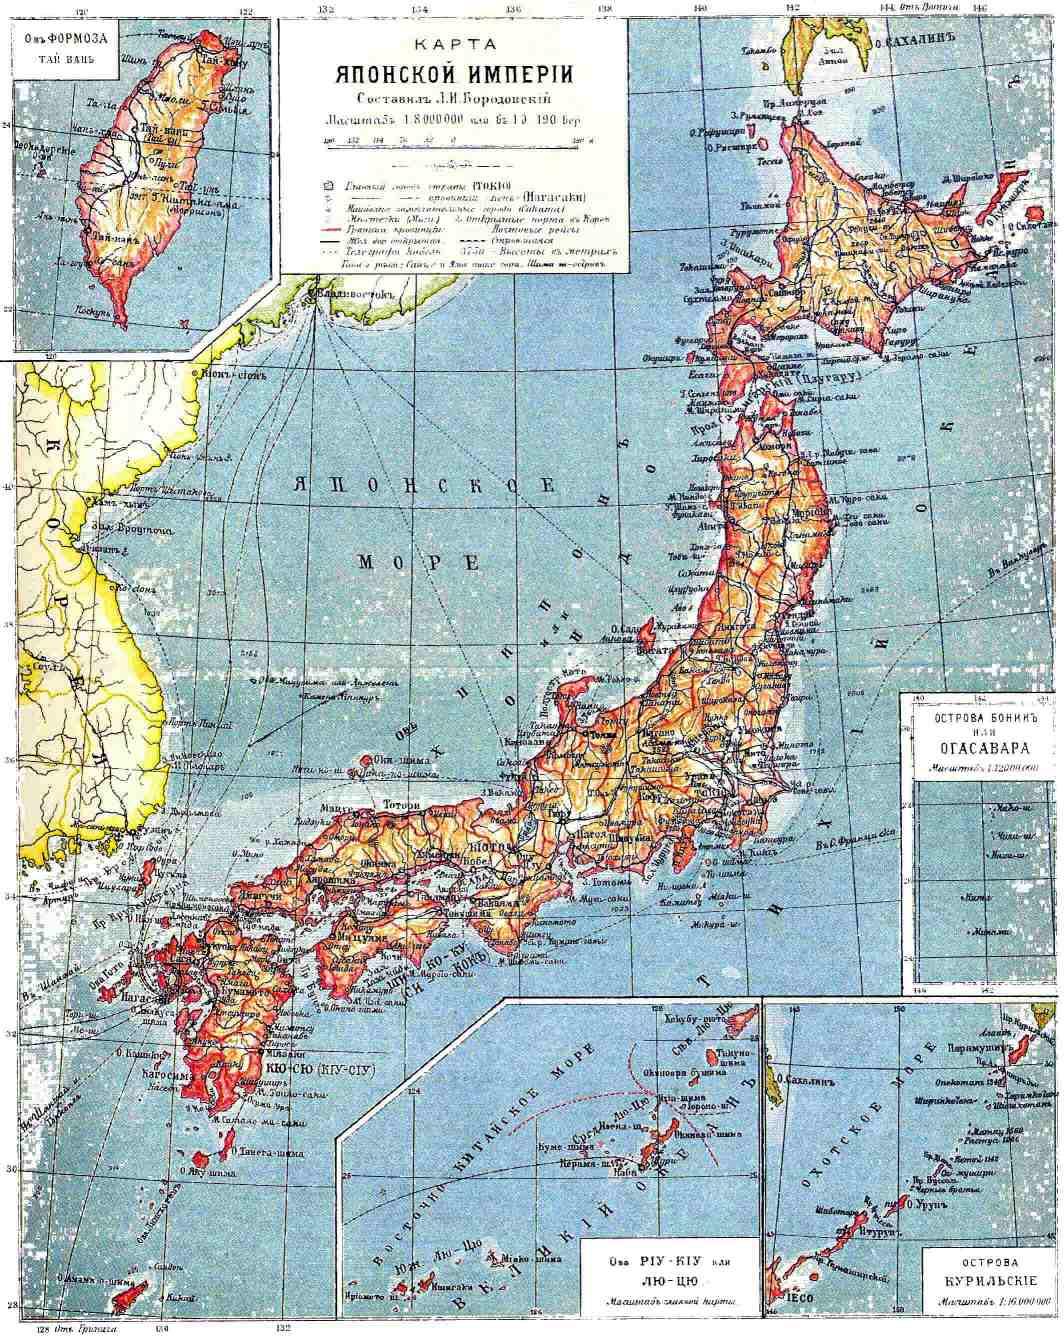 http://upload.wikimedia.org/wikipedia/commons/0/0f/Japan_map_Brochhaus.jpg